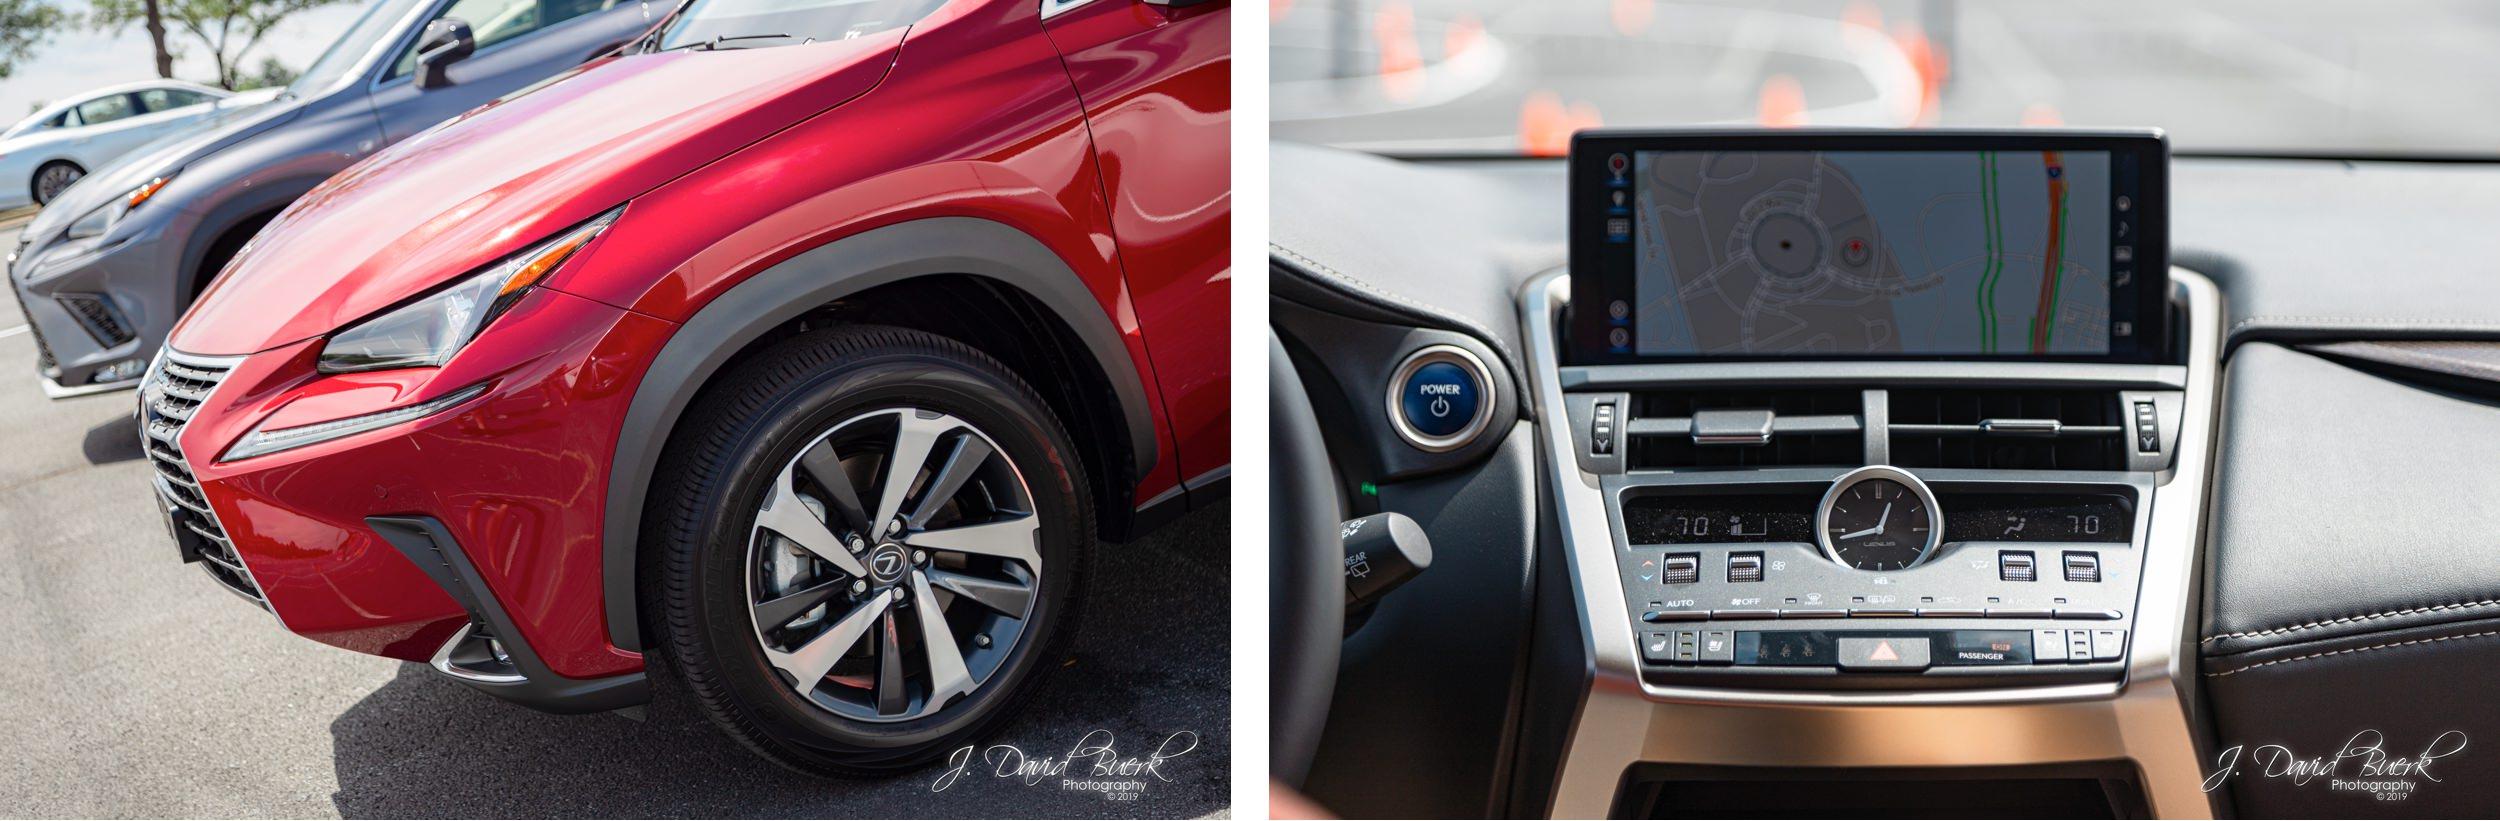 20190810 - Lexus Experience Amazing Drive Event 8.jpg